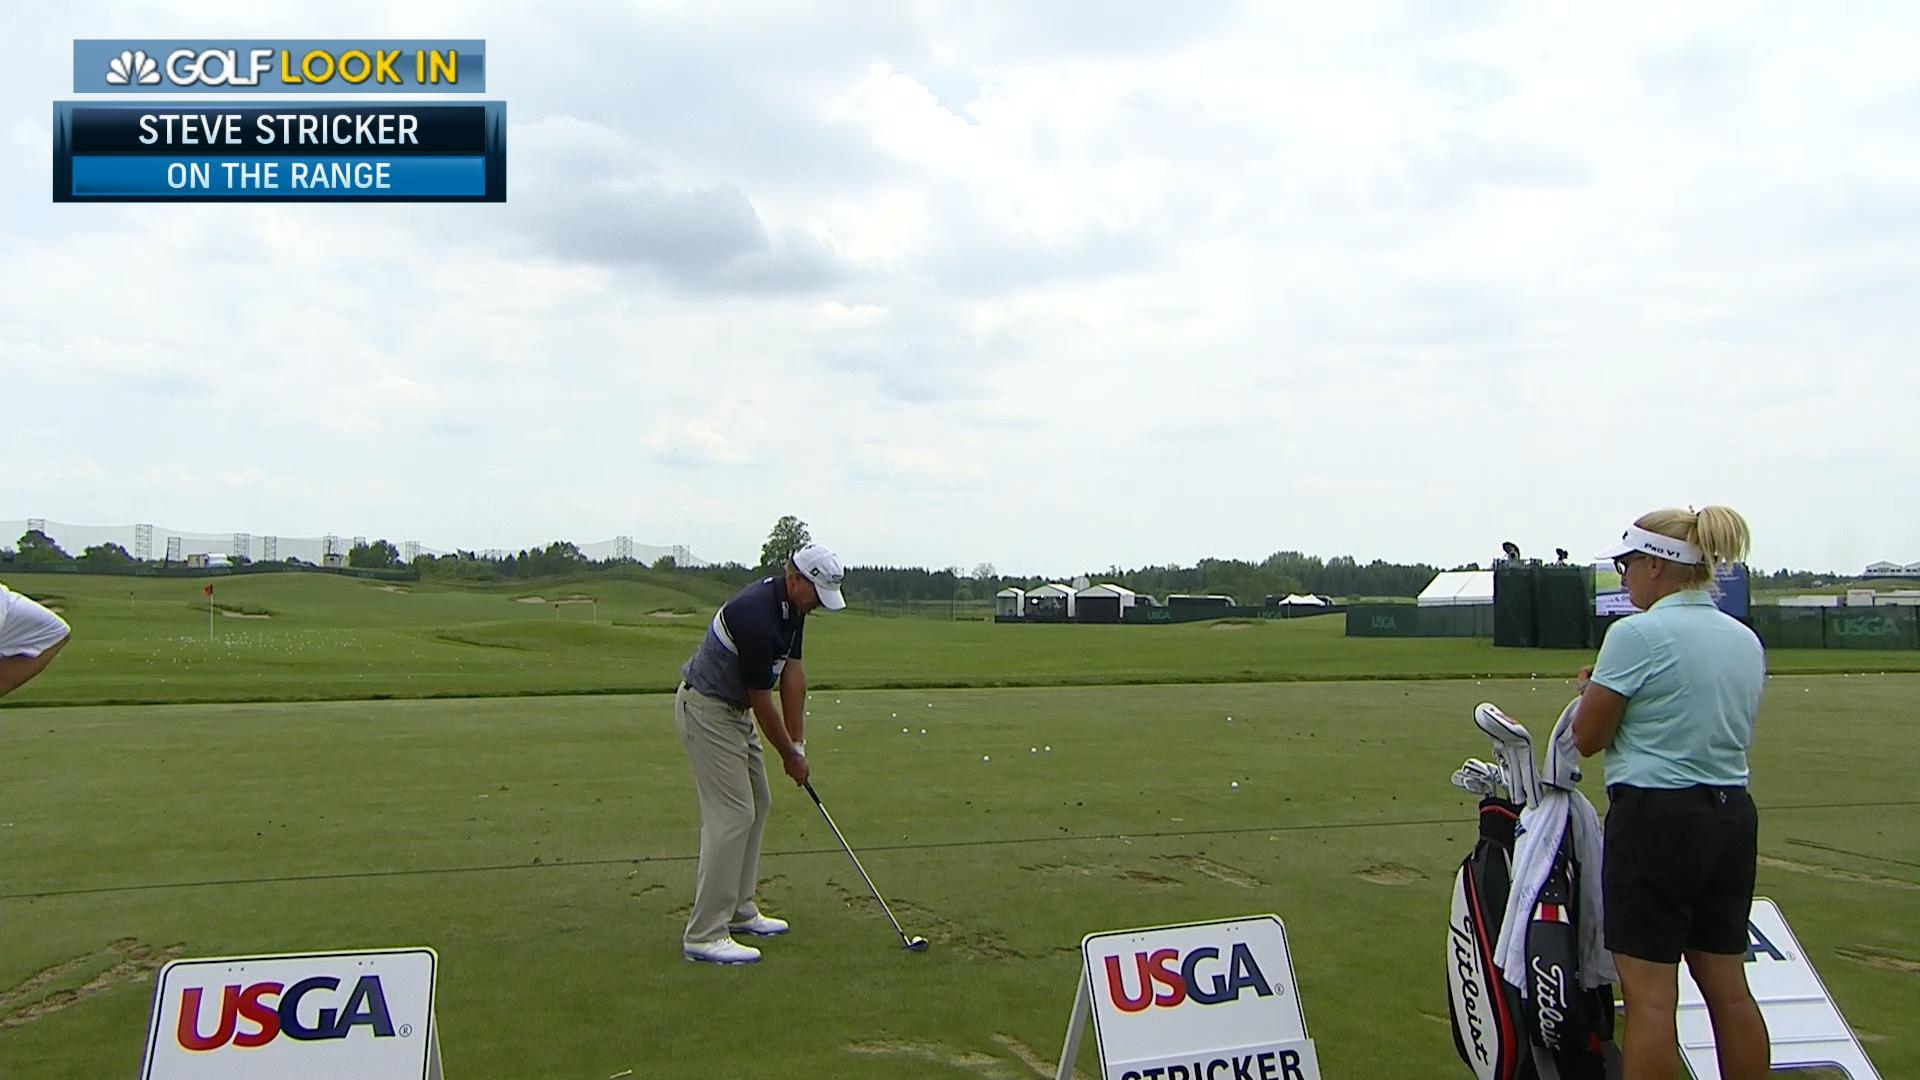 2017 U.S. Open Golf Championship Highlights   Golf Channel